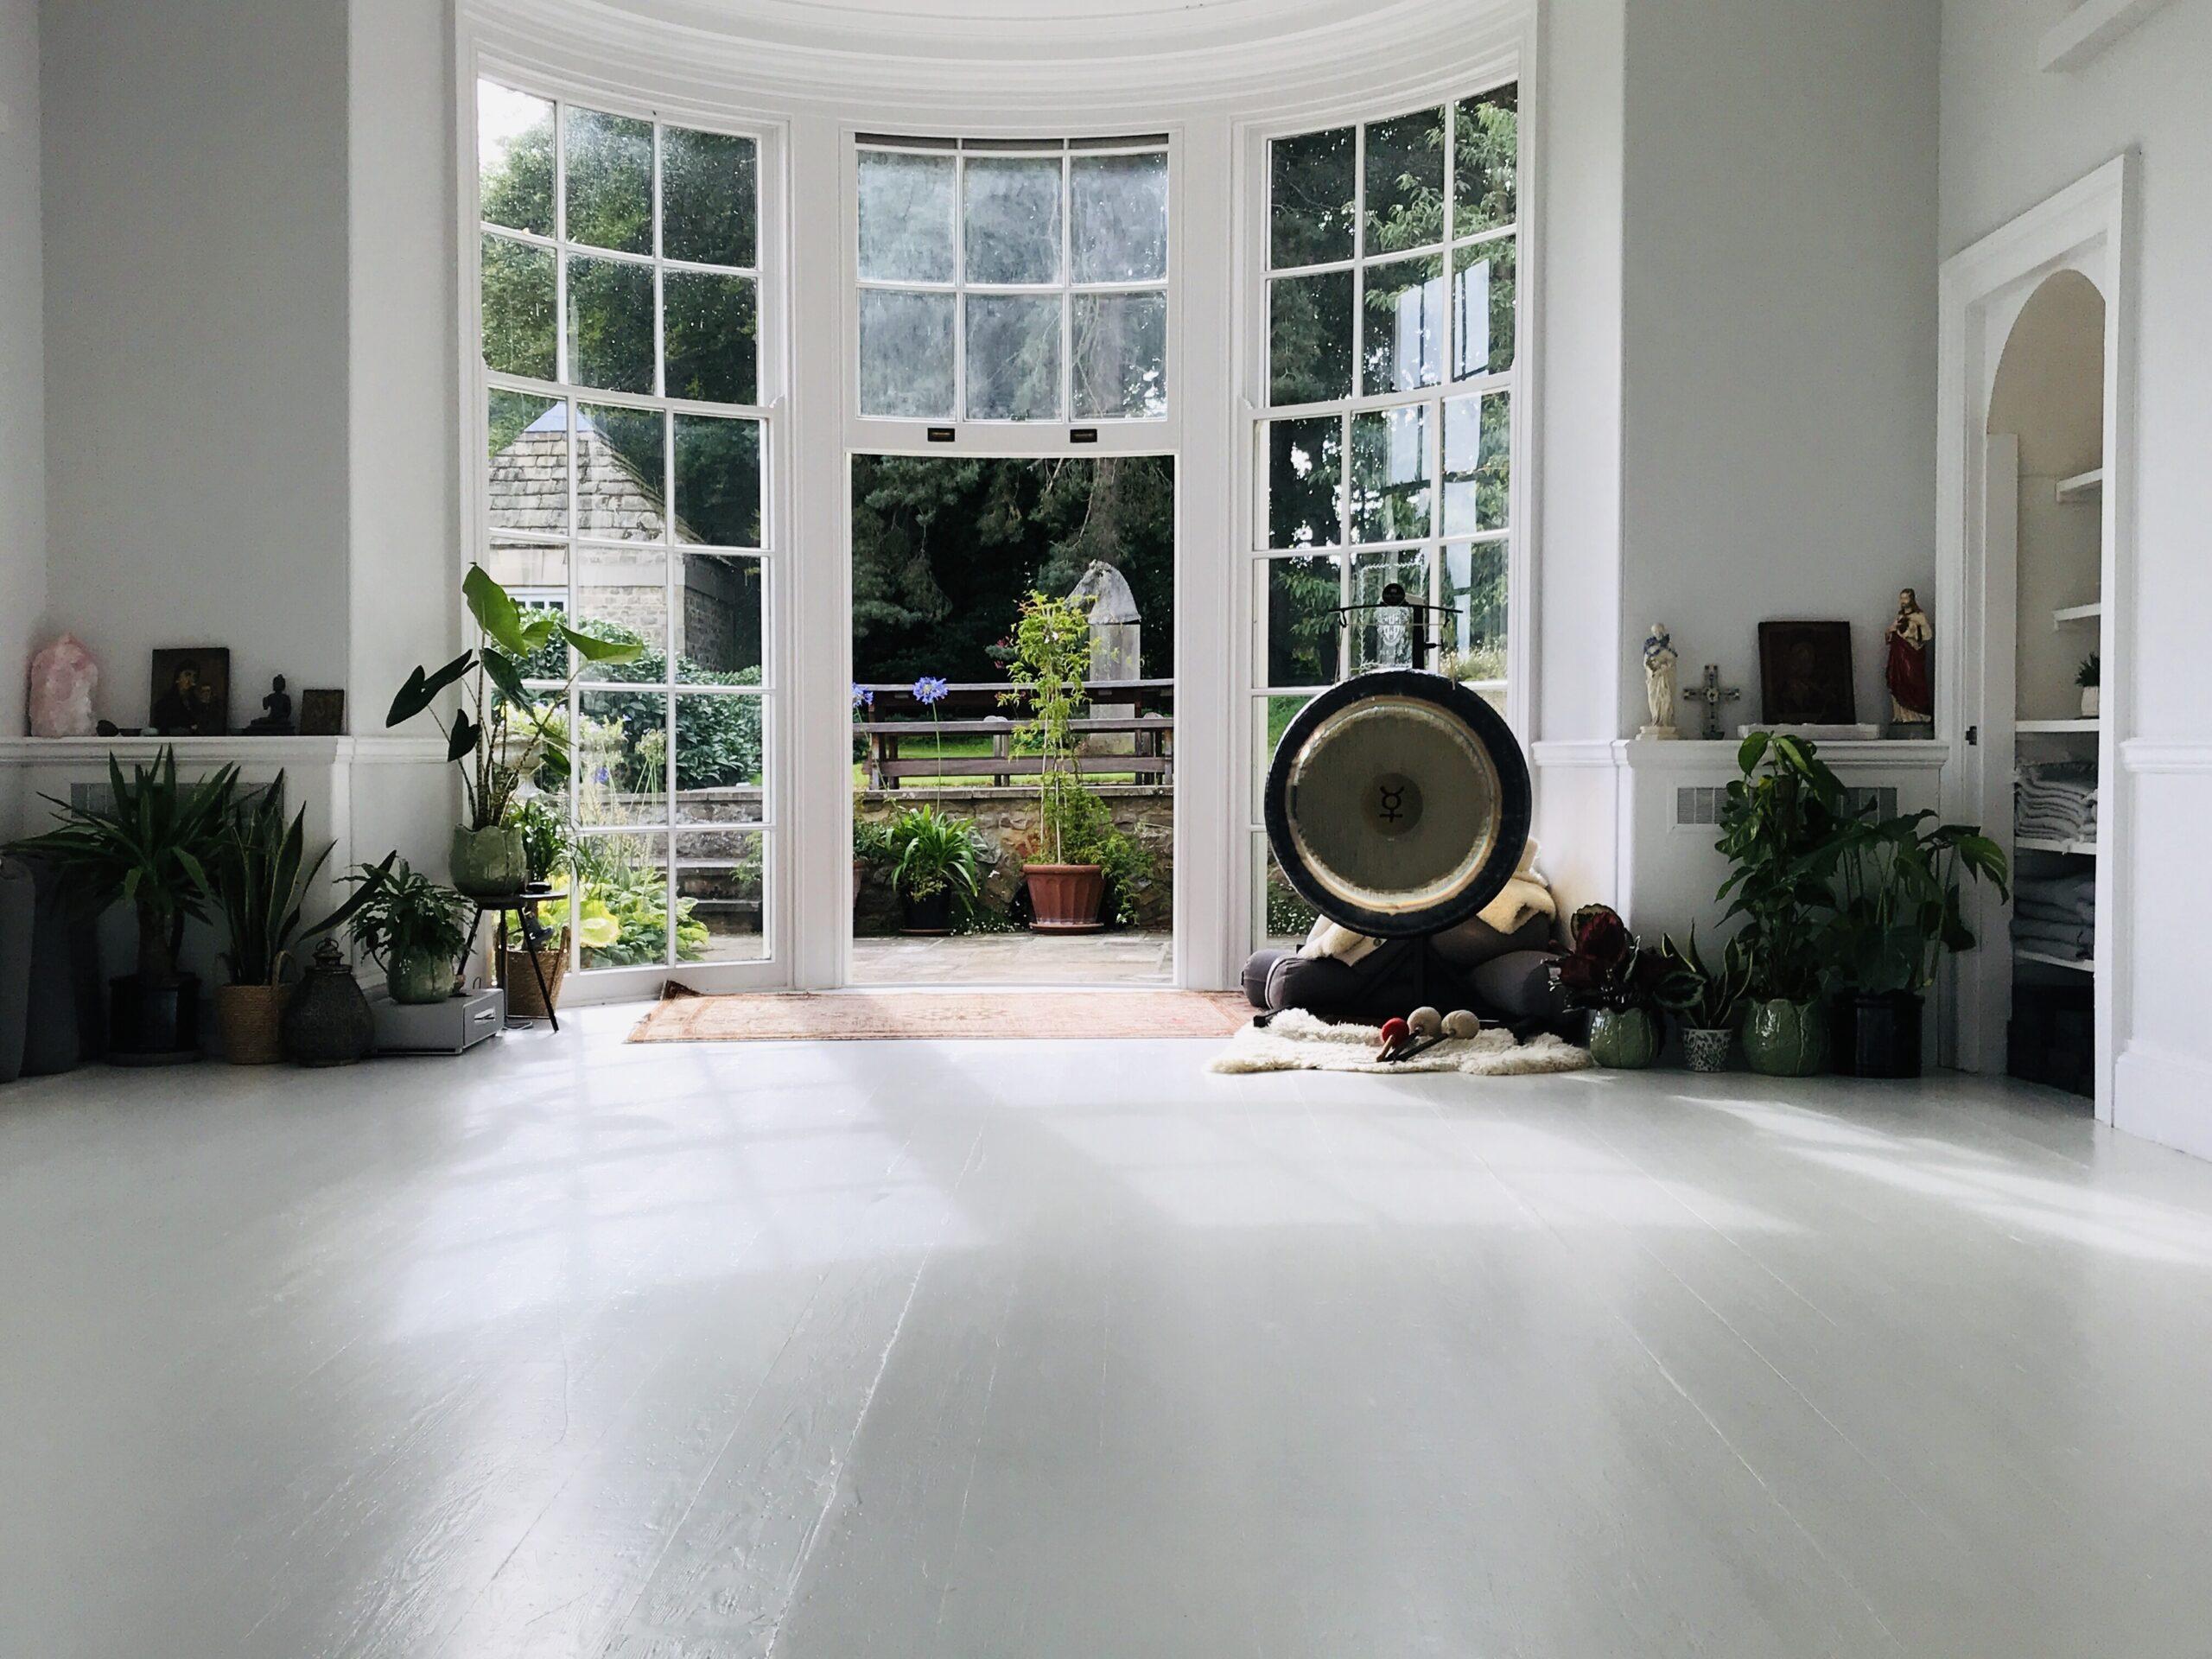 Studio Ananda at YogaSpaceYorkshire yoga retreat and yoga studio North Yorkshire